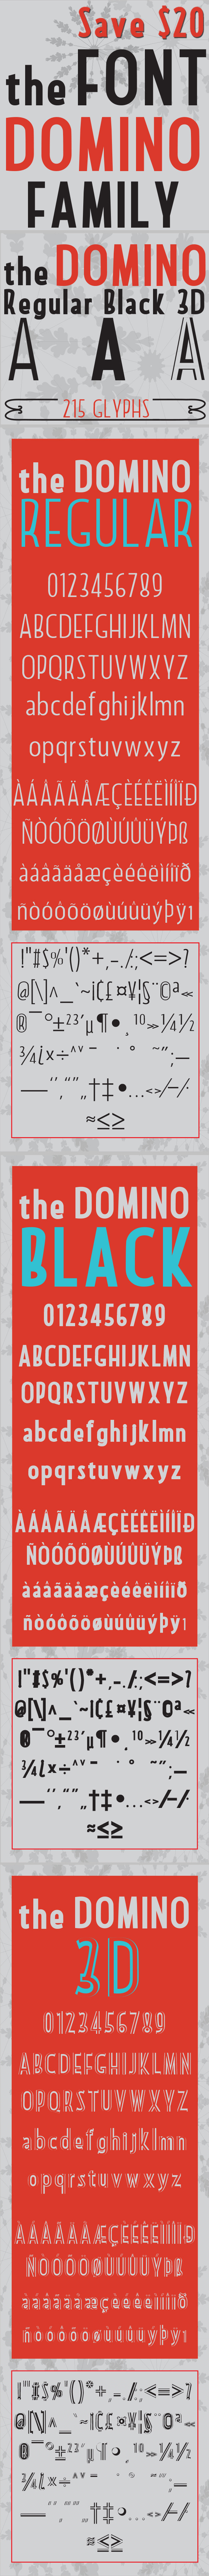 Domino Font